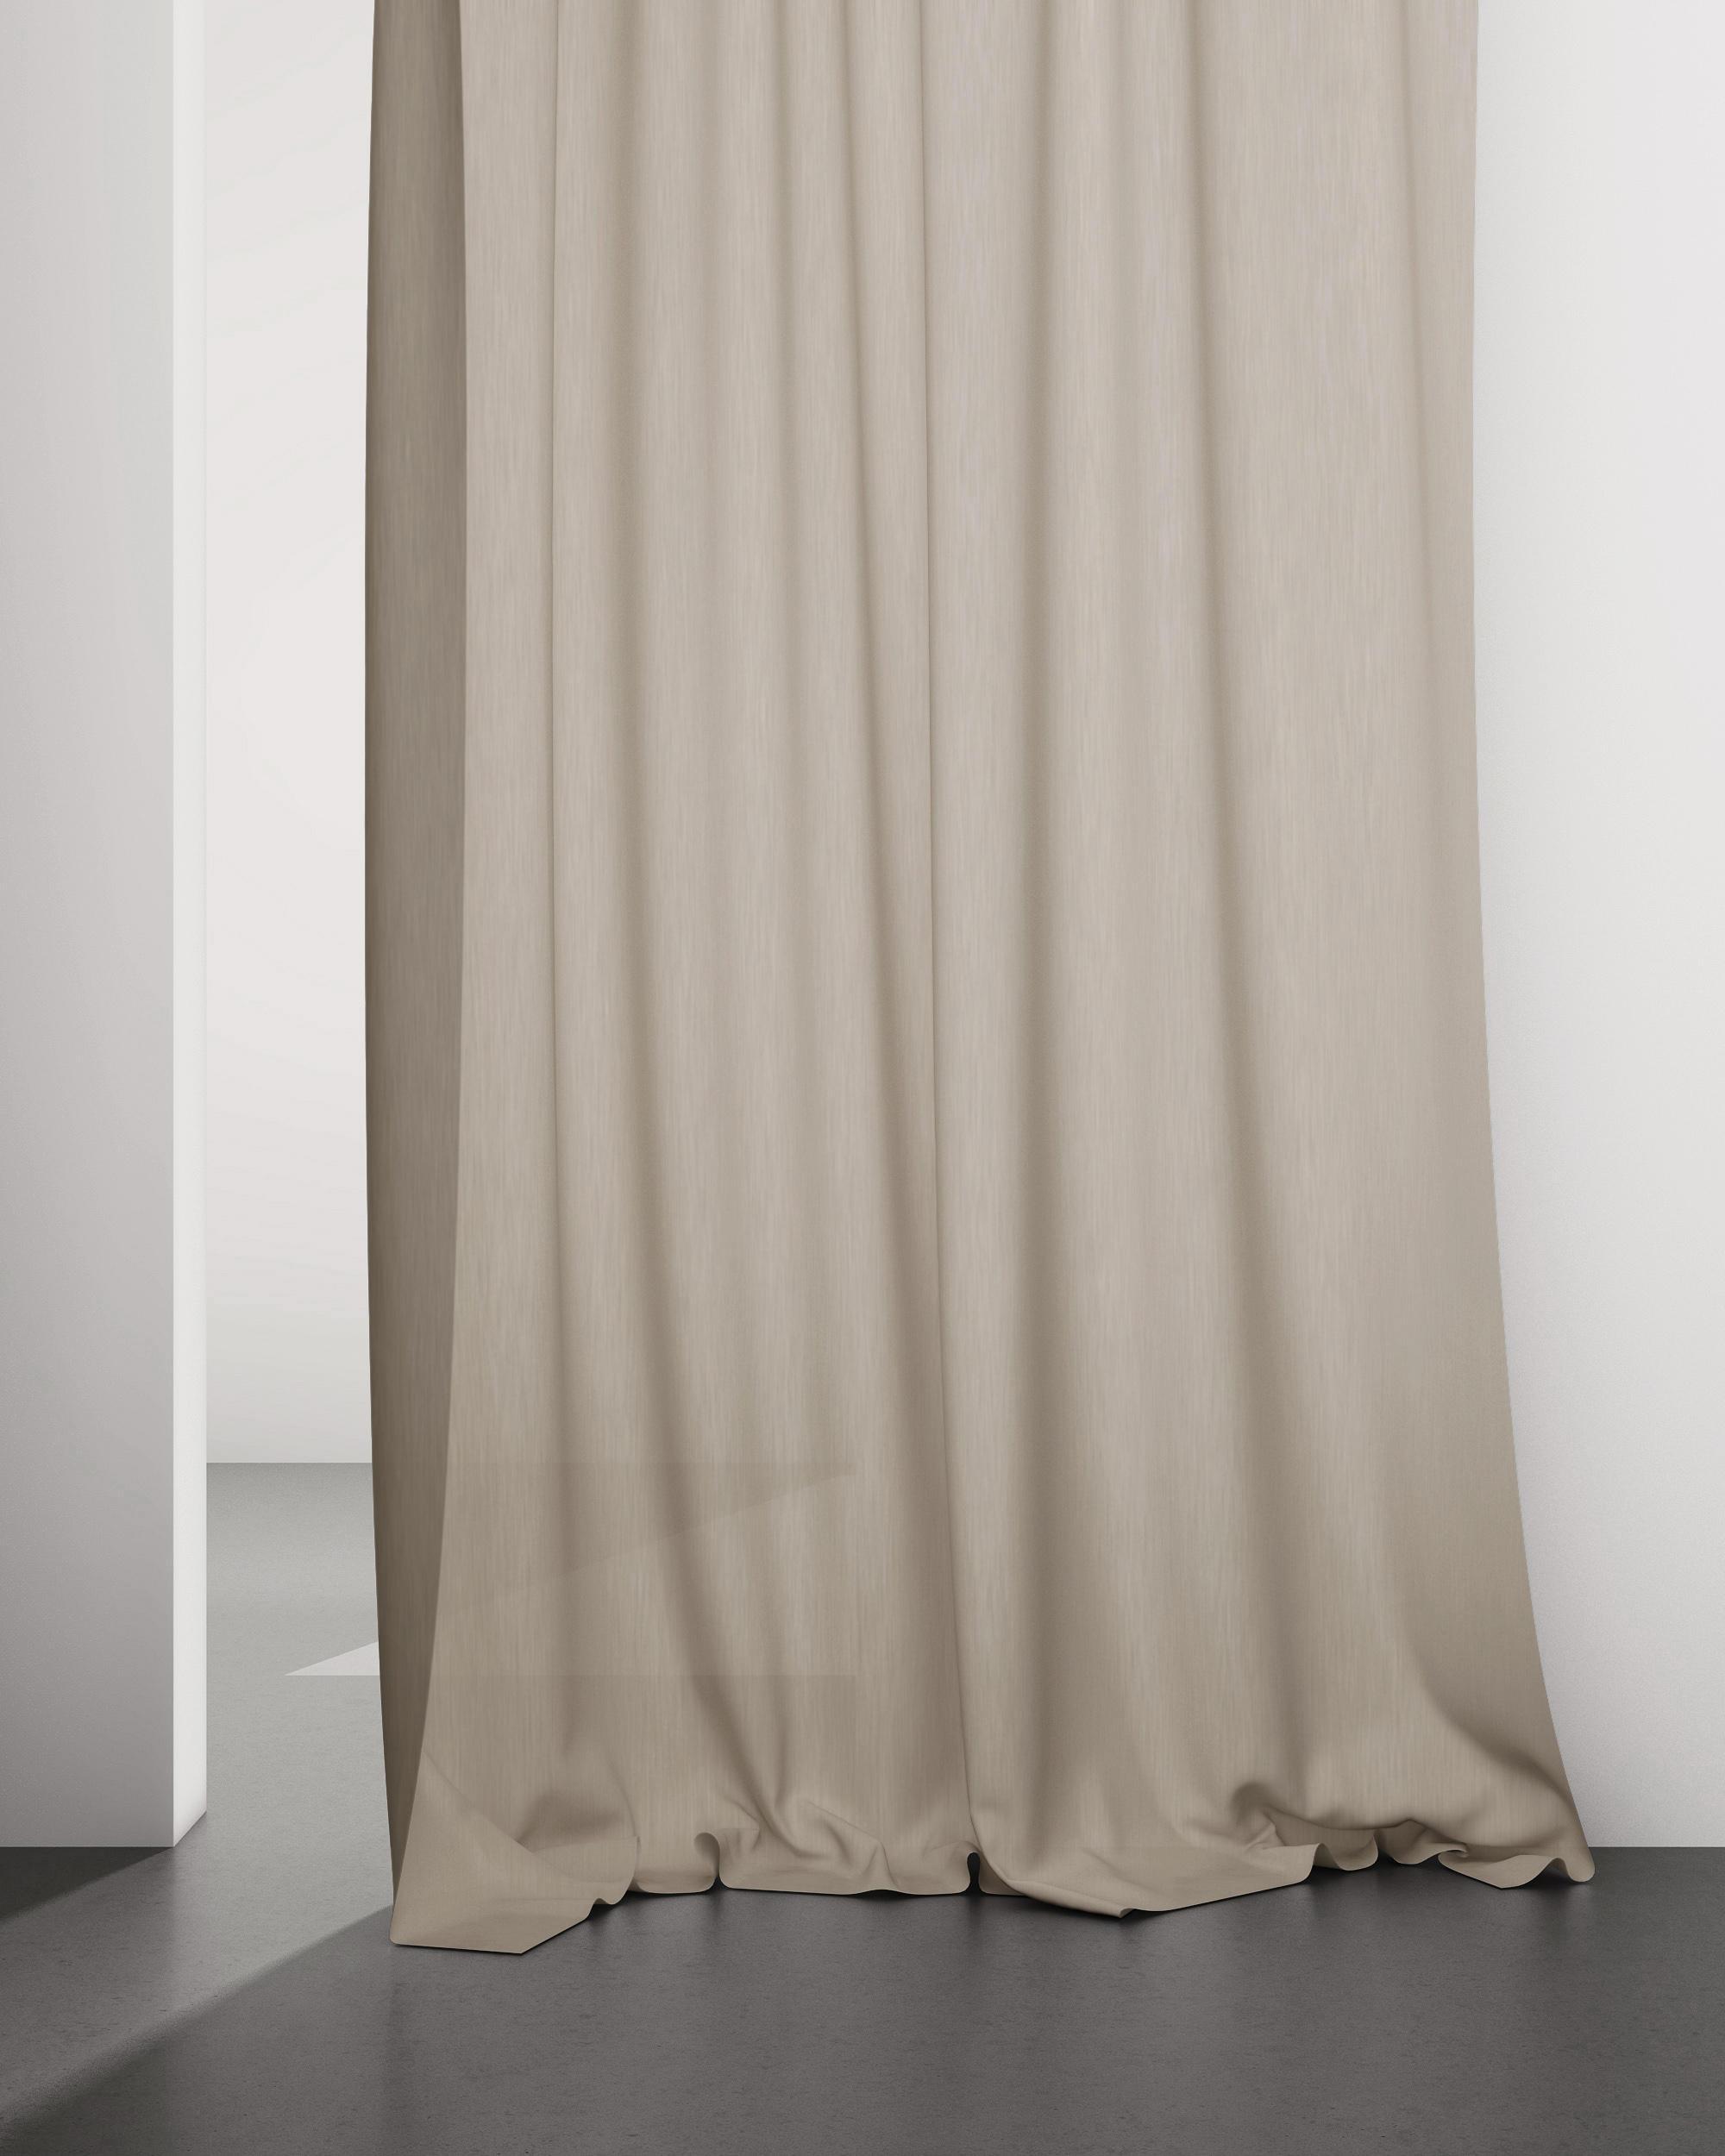 Luxor 05 Bone Curtain Fabrics From Nya Nordiska